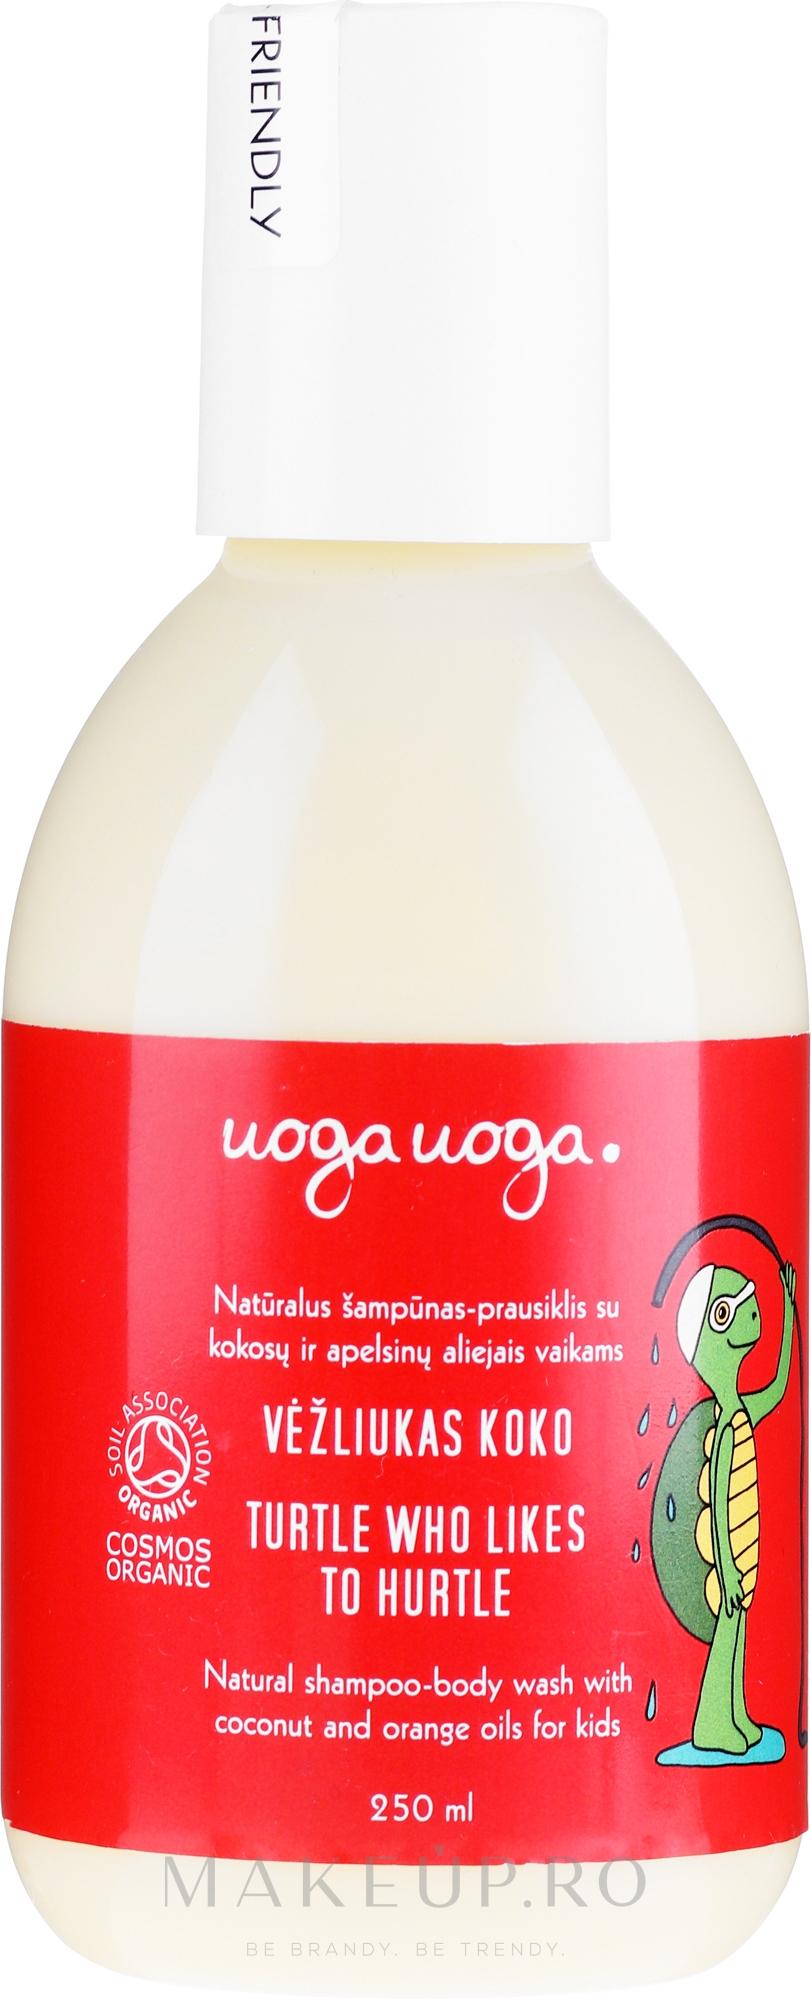 Gel de duș - Uoga Uoga Turtle Who Likes To Hurtle Natural Shampoo-Body Wash — Imagine 250 ml